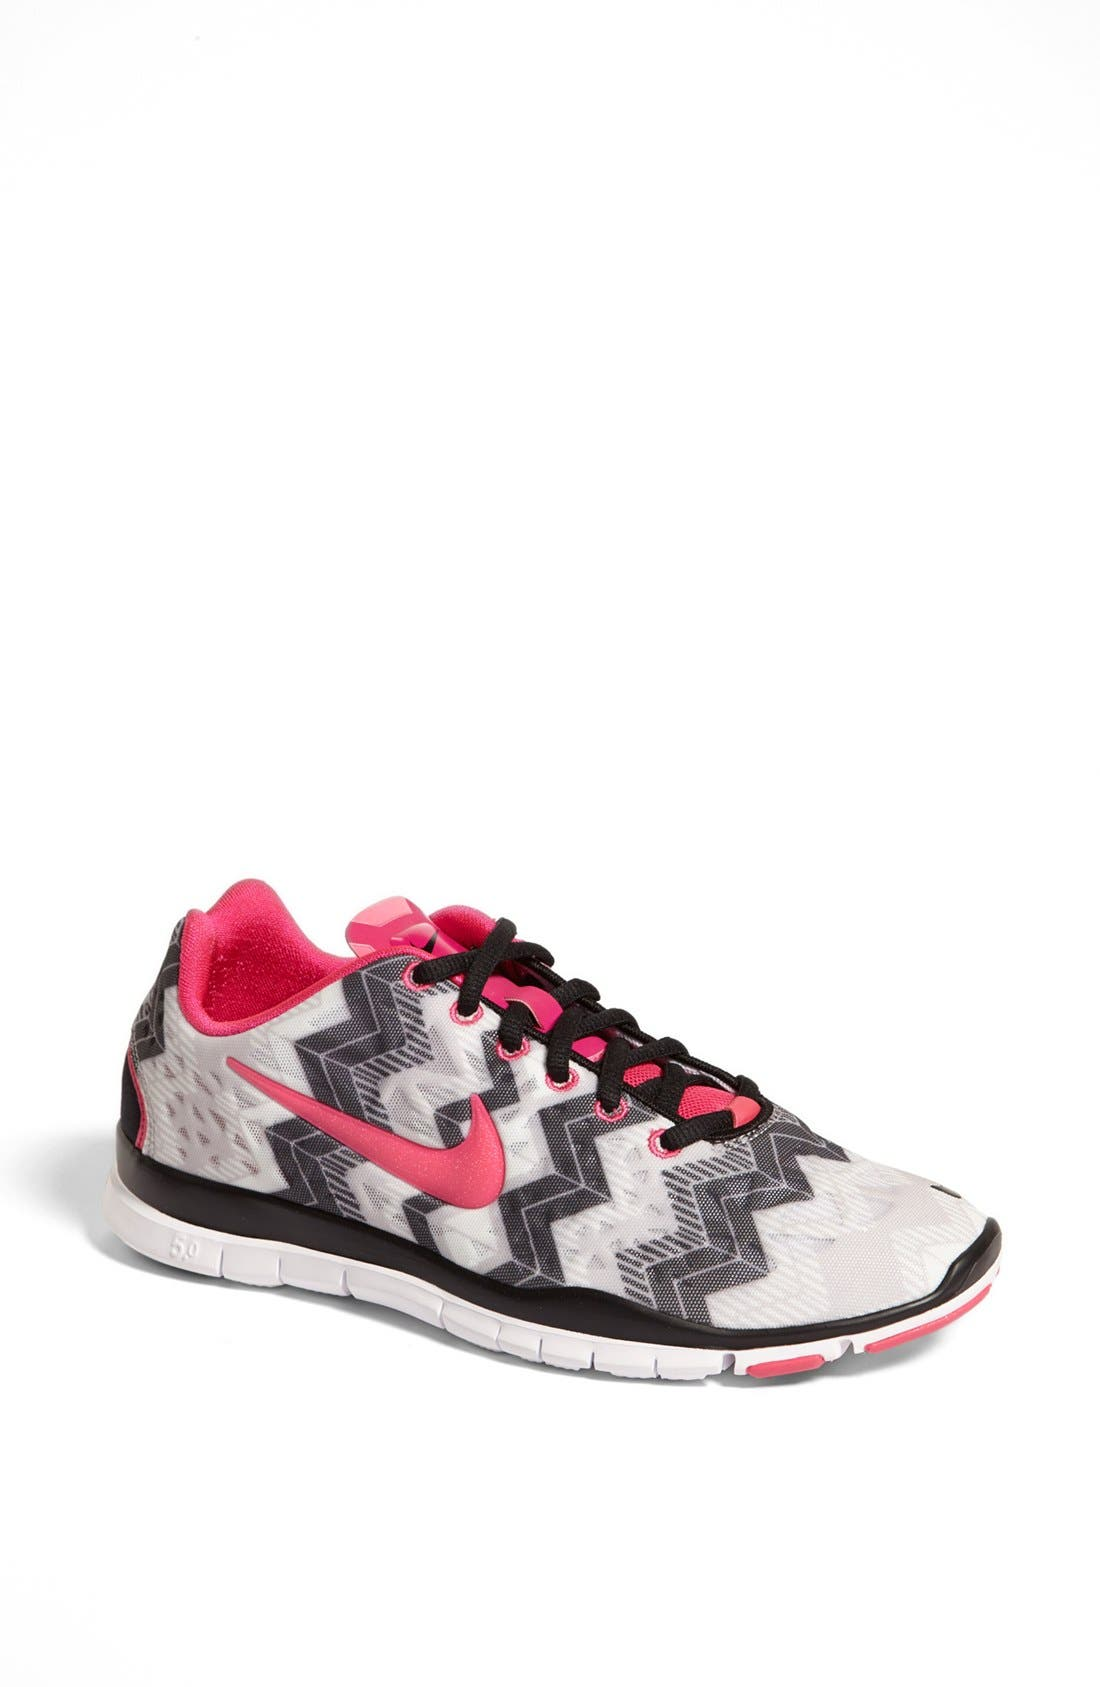 c4a224db7e0666 Womens Nike Free Tr Fit 3 Rainbow Dress